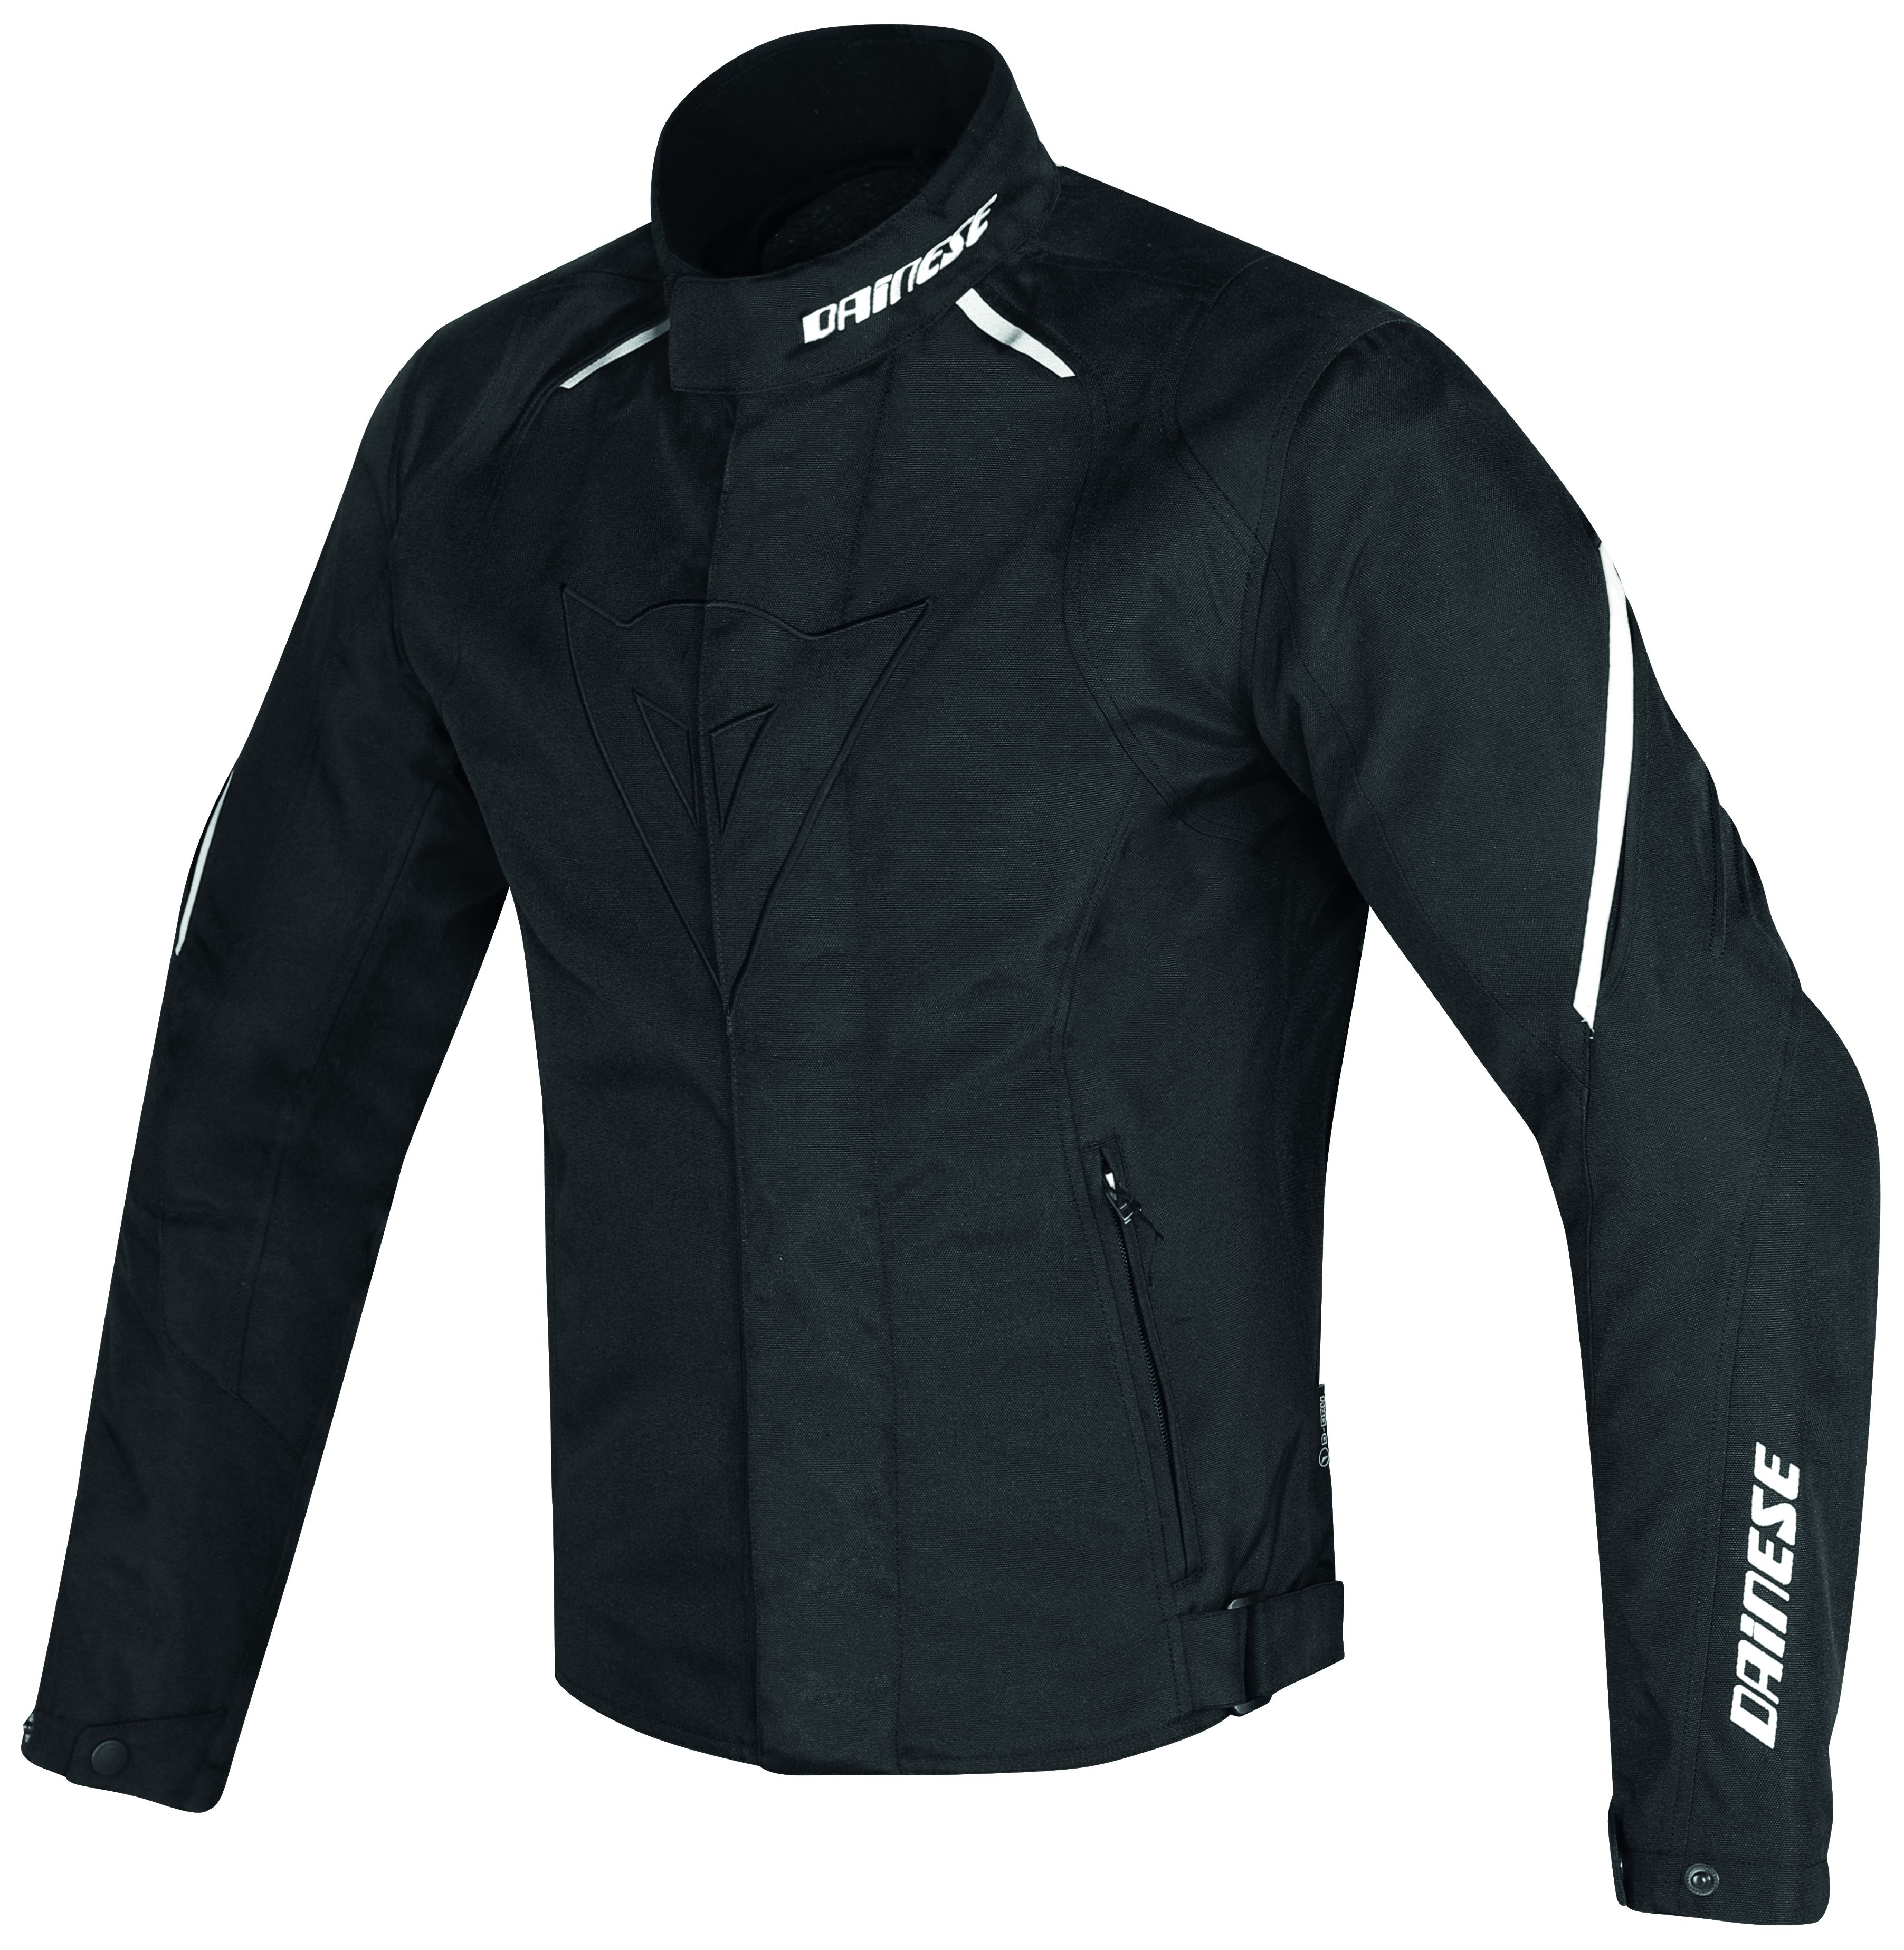 Dainese laguna seca d1 d dry jacket revzilla for D garage dainese corbeil horaires